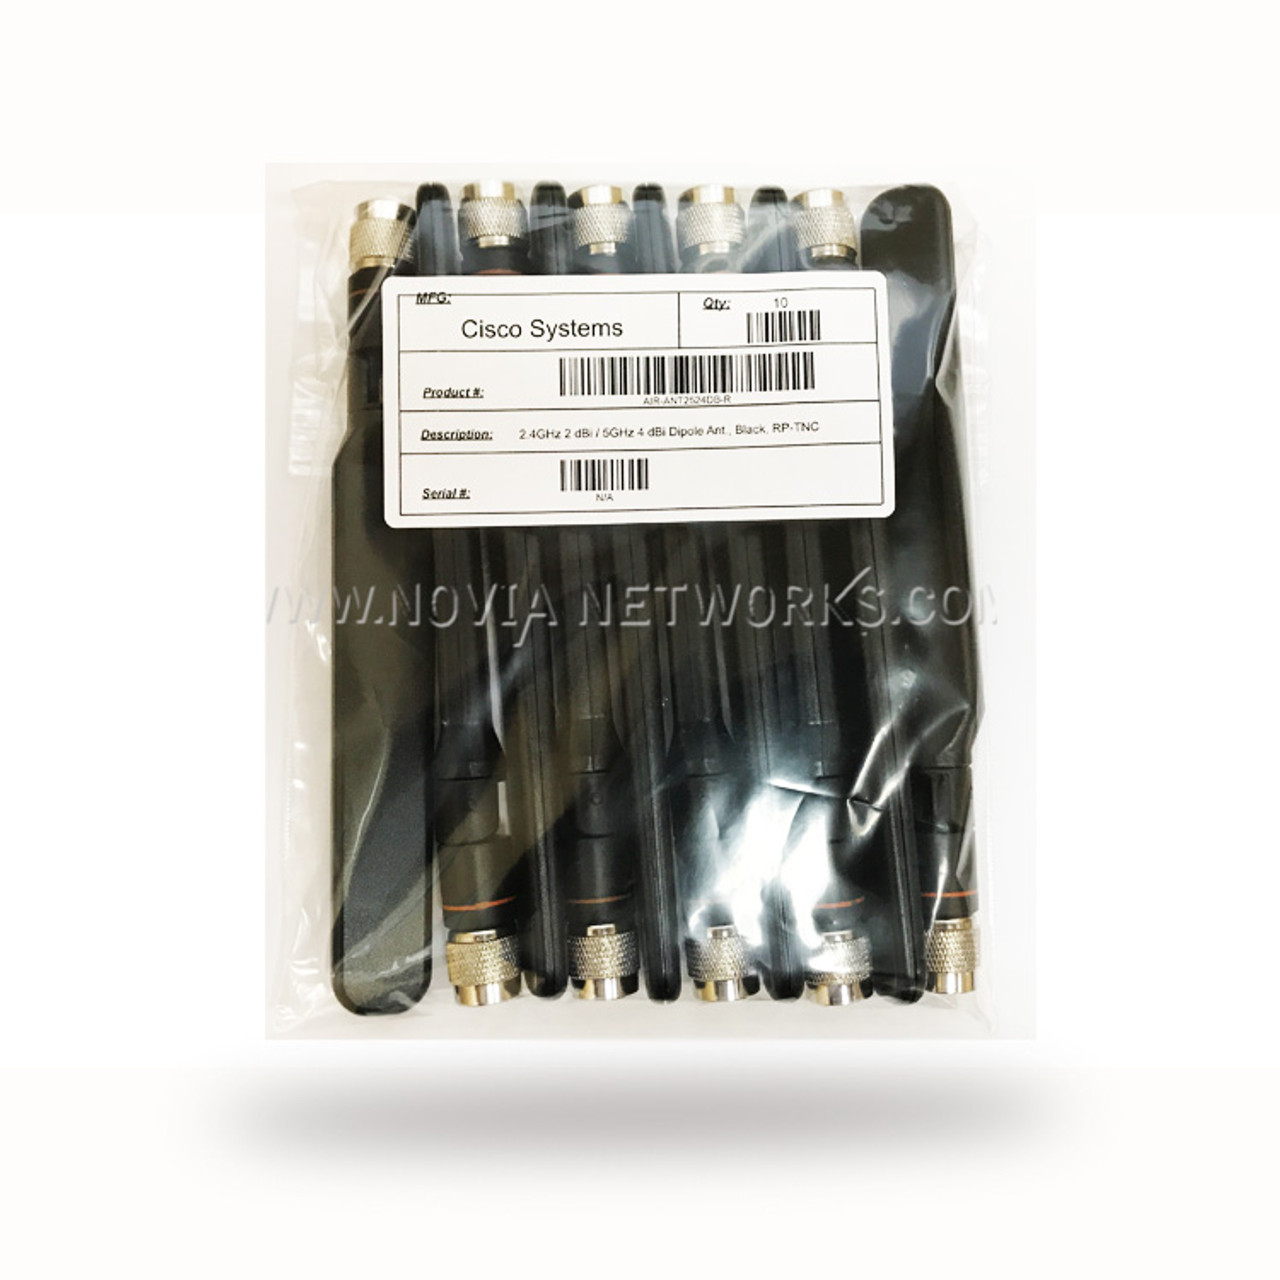 AIR-ANT2524DB-R packaged in ten pack